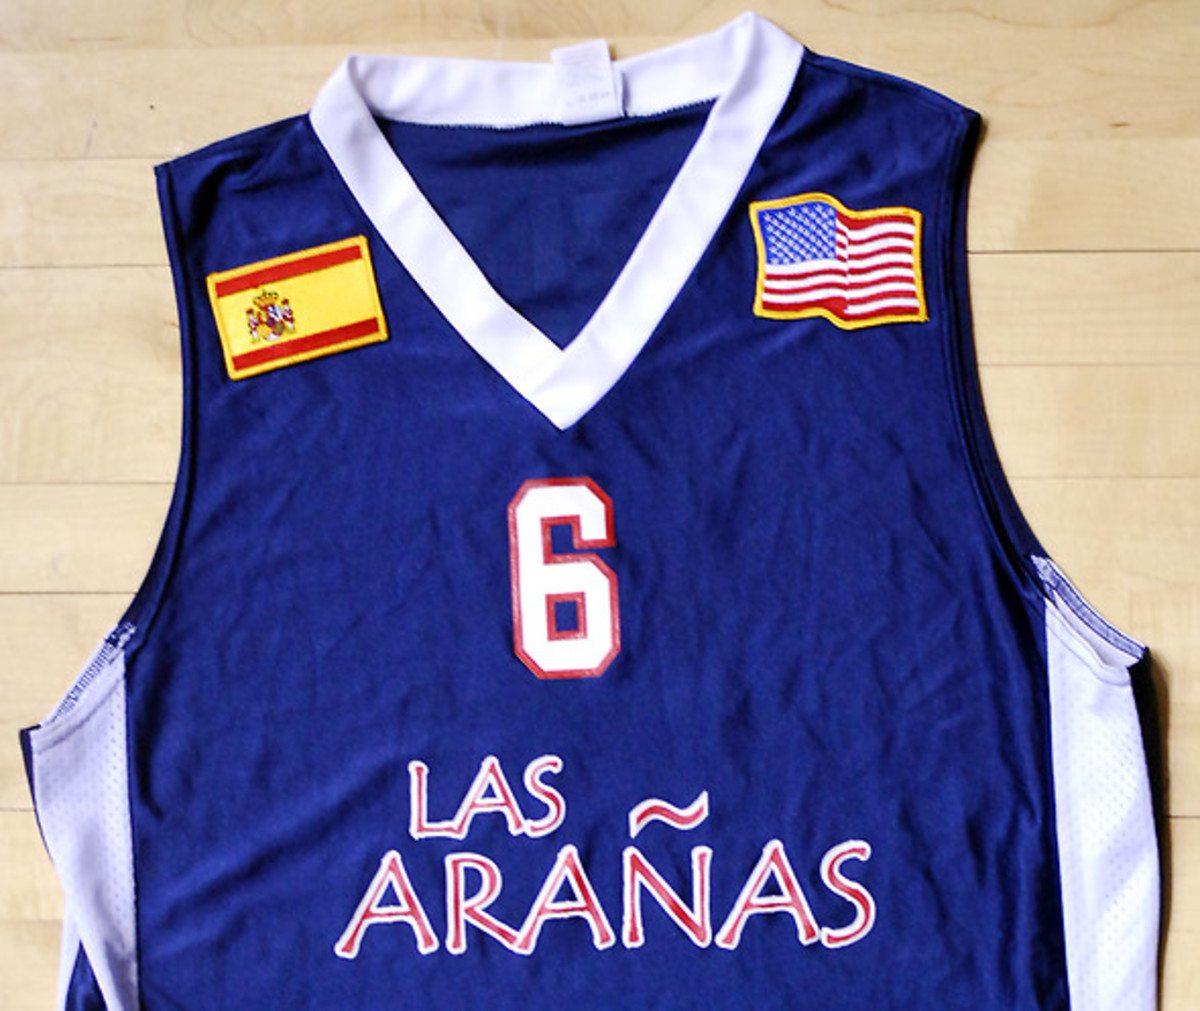 Las Aranas